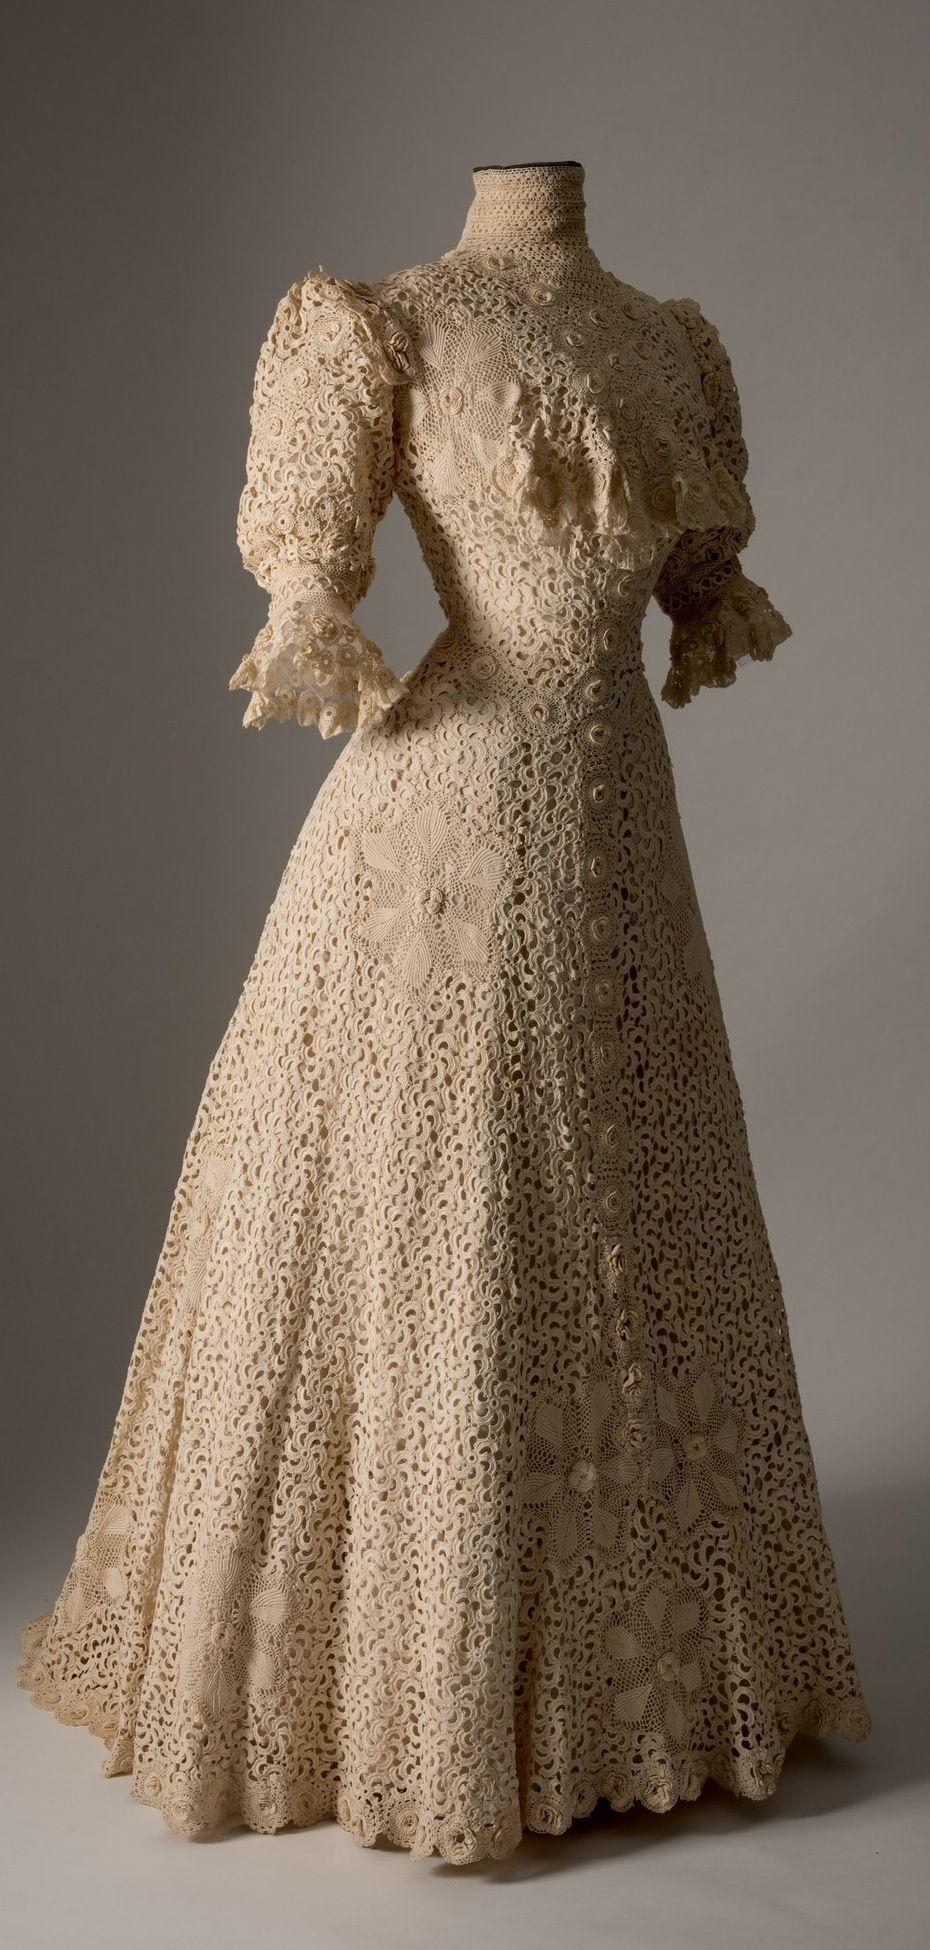 Collection of Fashion Museum Bath  viaCream crochet lace dress  c  1900  Collection of Fashion Museum  . Bath Fashion Museum Gift Shop. Home Design Ideas